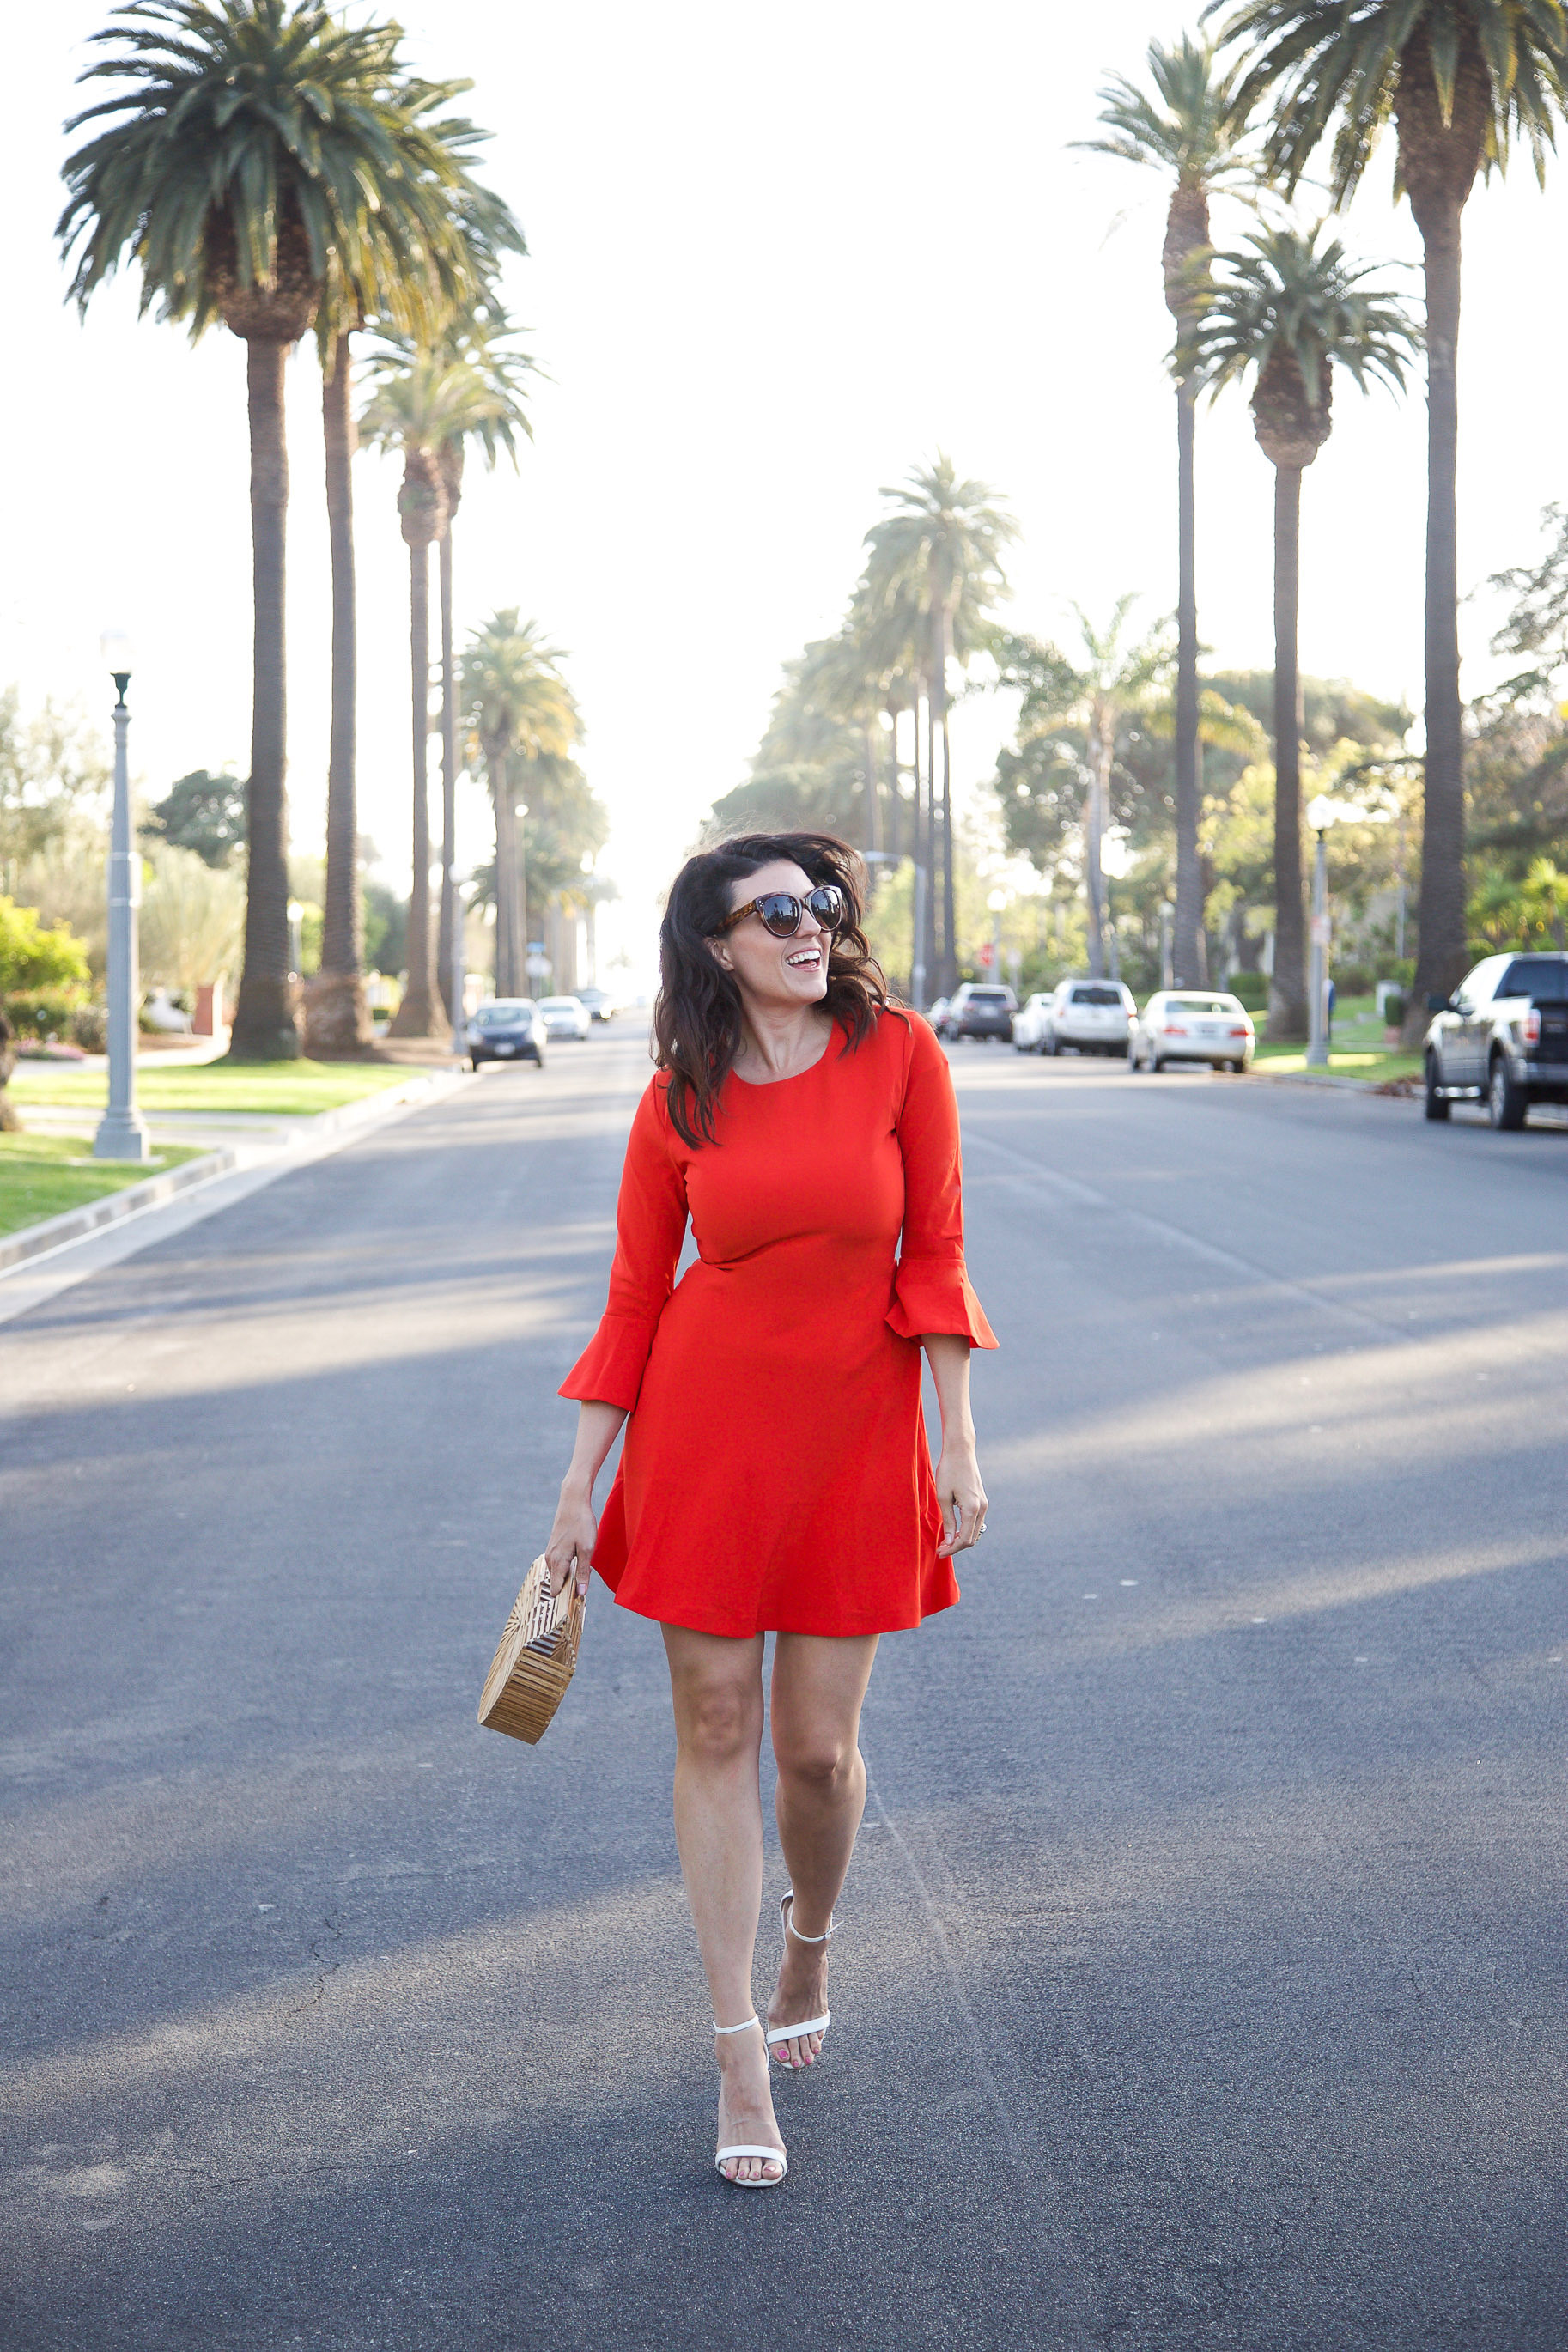 Lucy-Paris-Red-Bell-Sleeved-Dress6.jpg